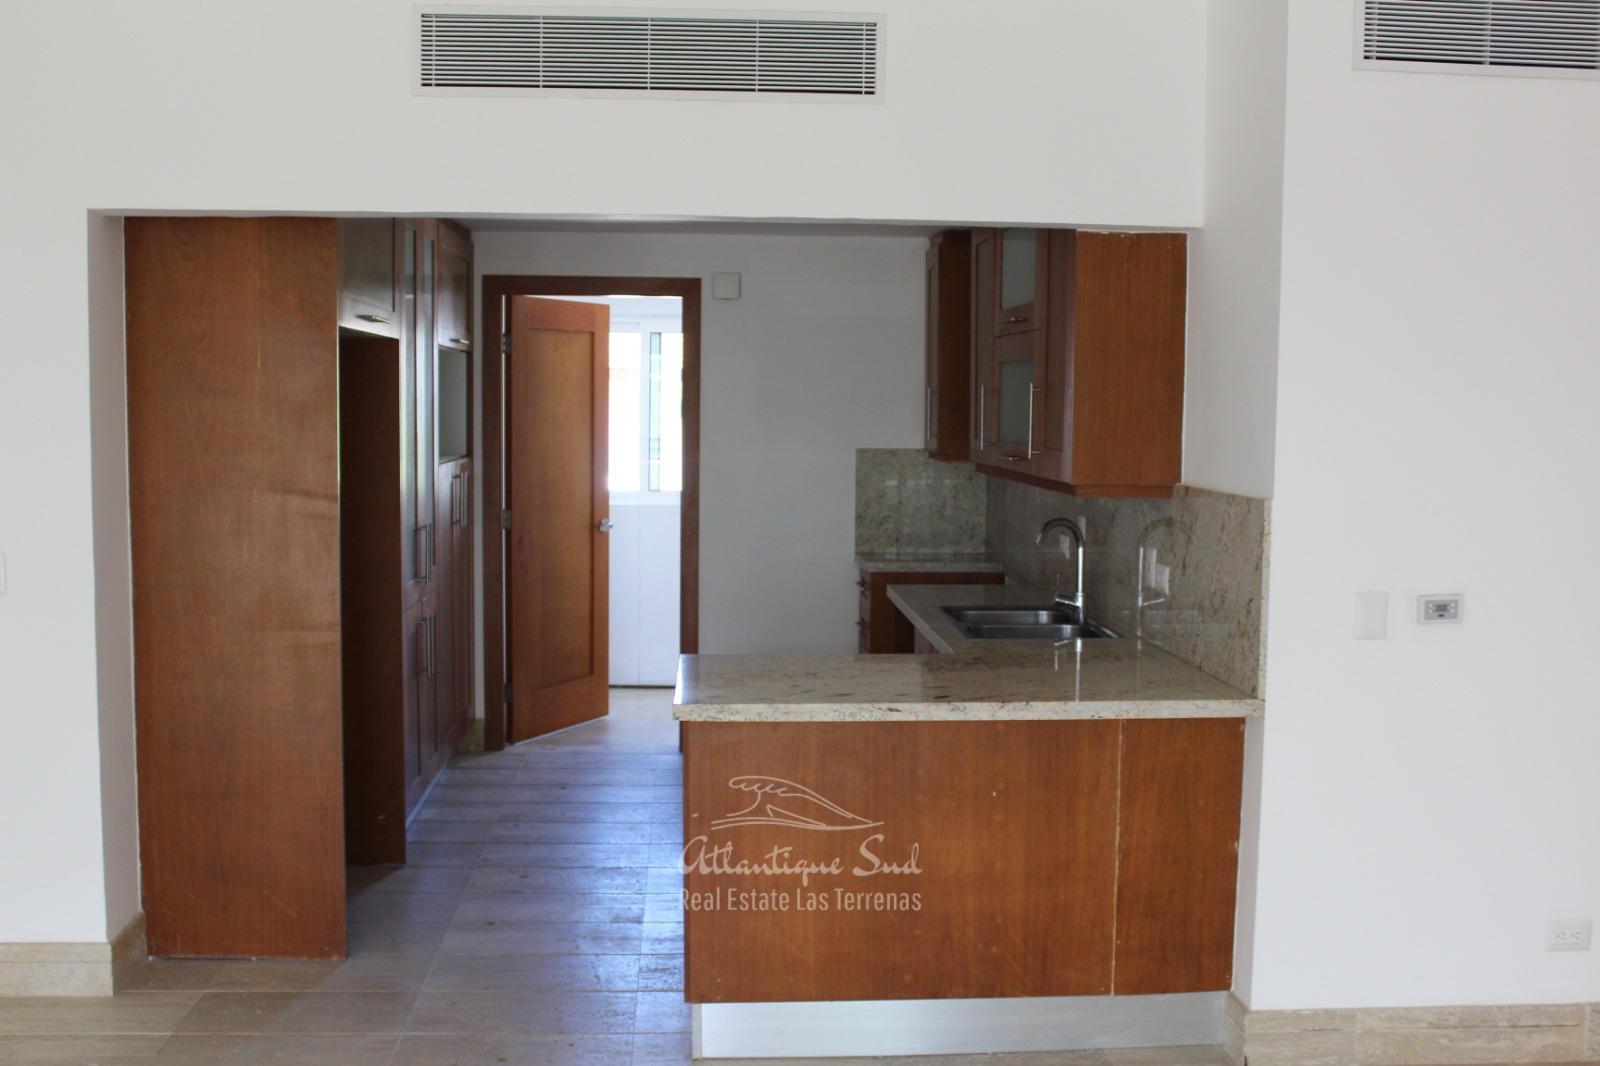 Apartments near the beach real estate las terrenas dominican republic 31 (17).jpg